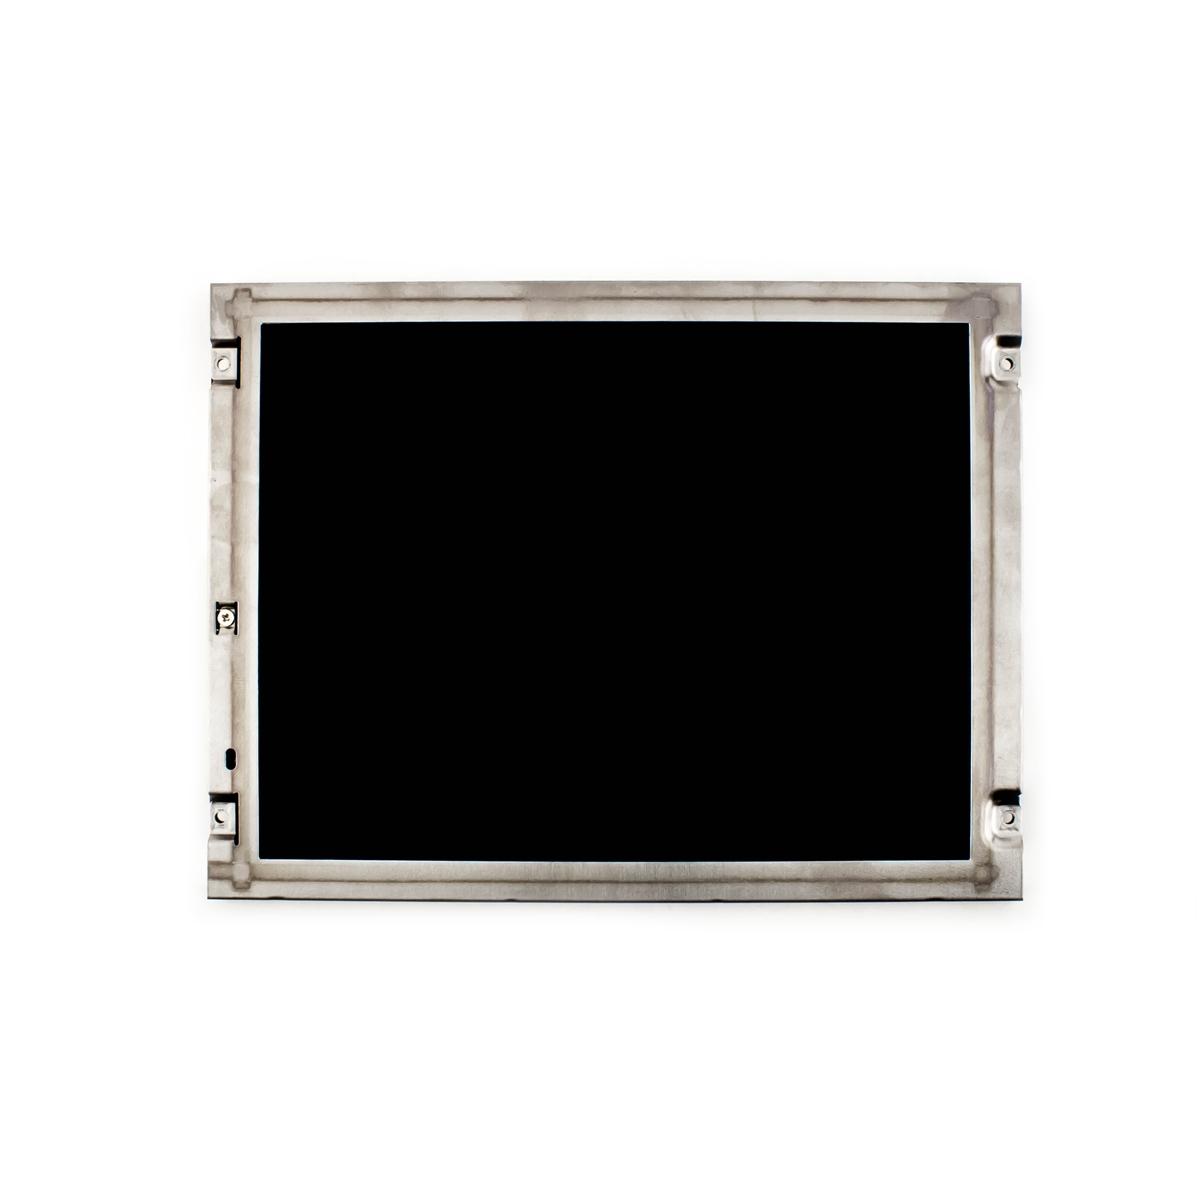 Philips MP5 TFT LCD Display Screen 8 4